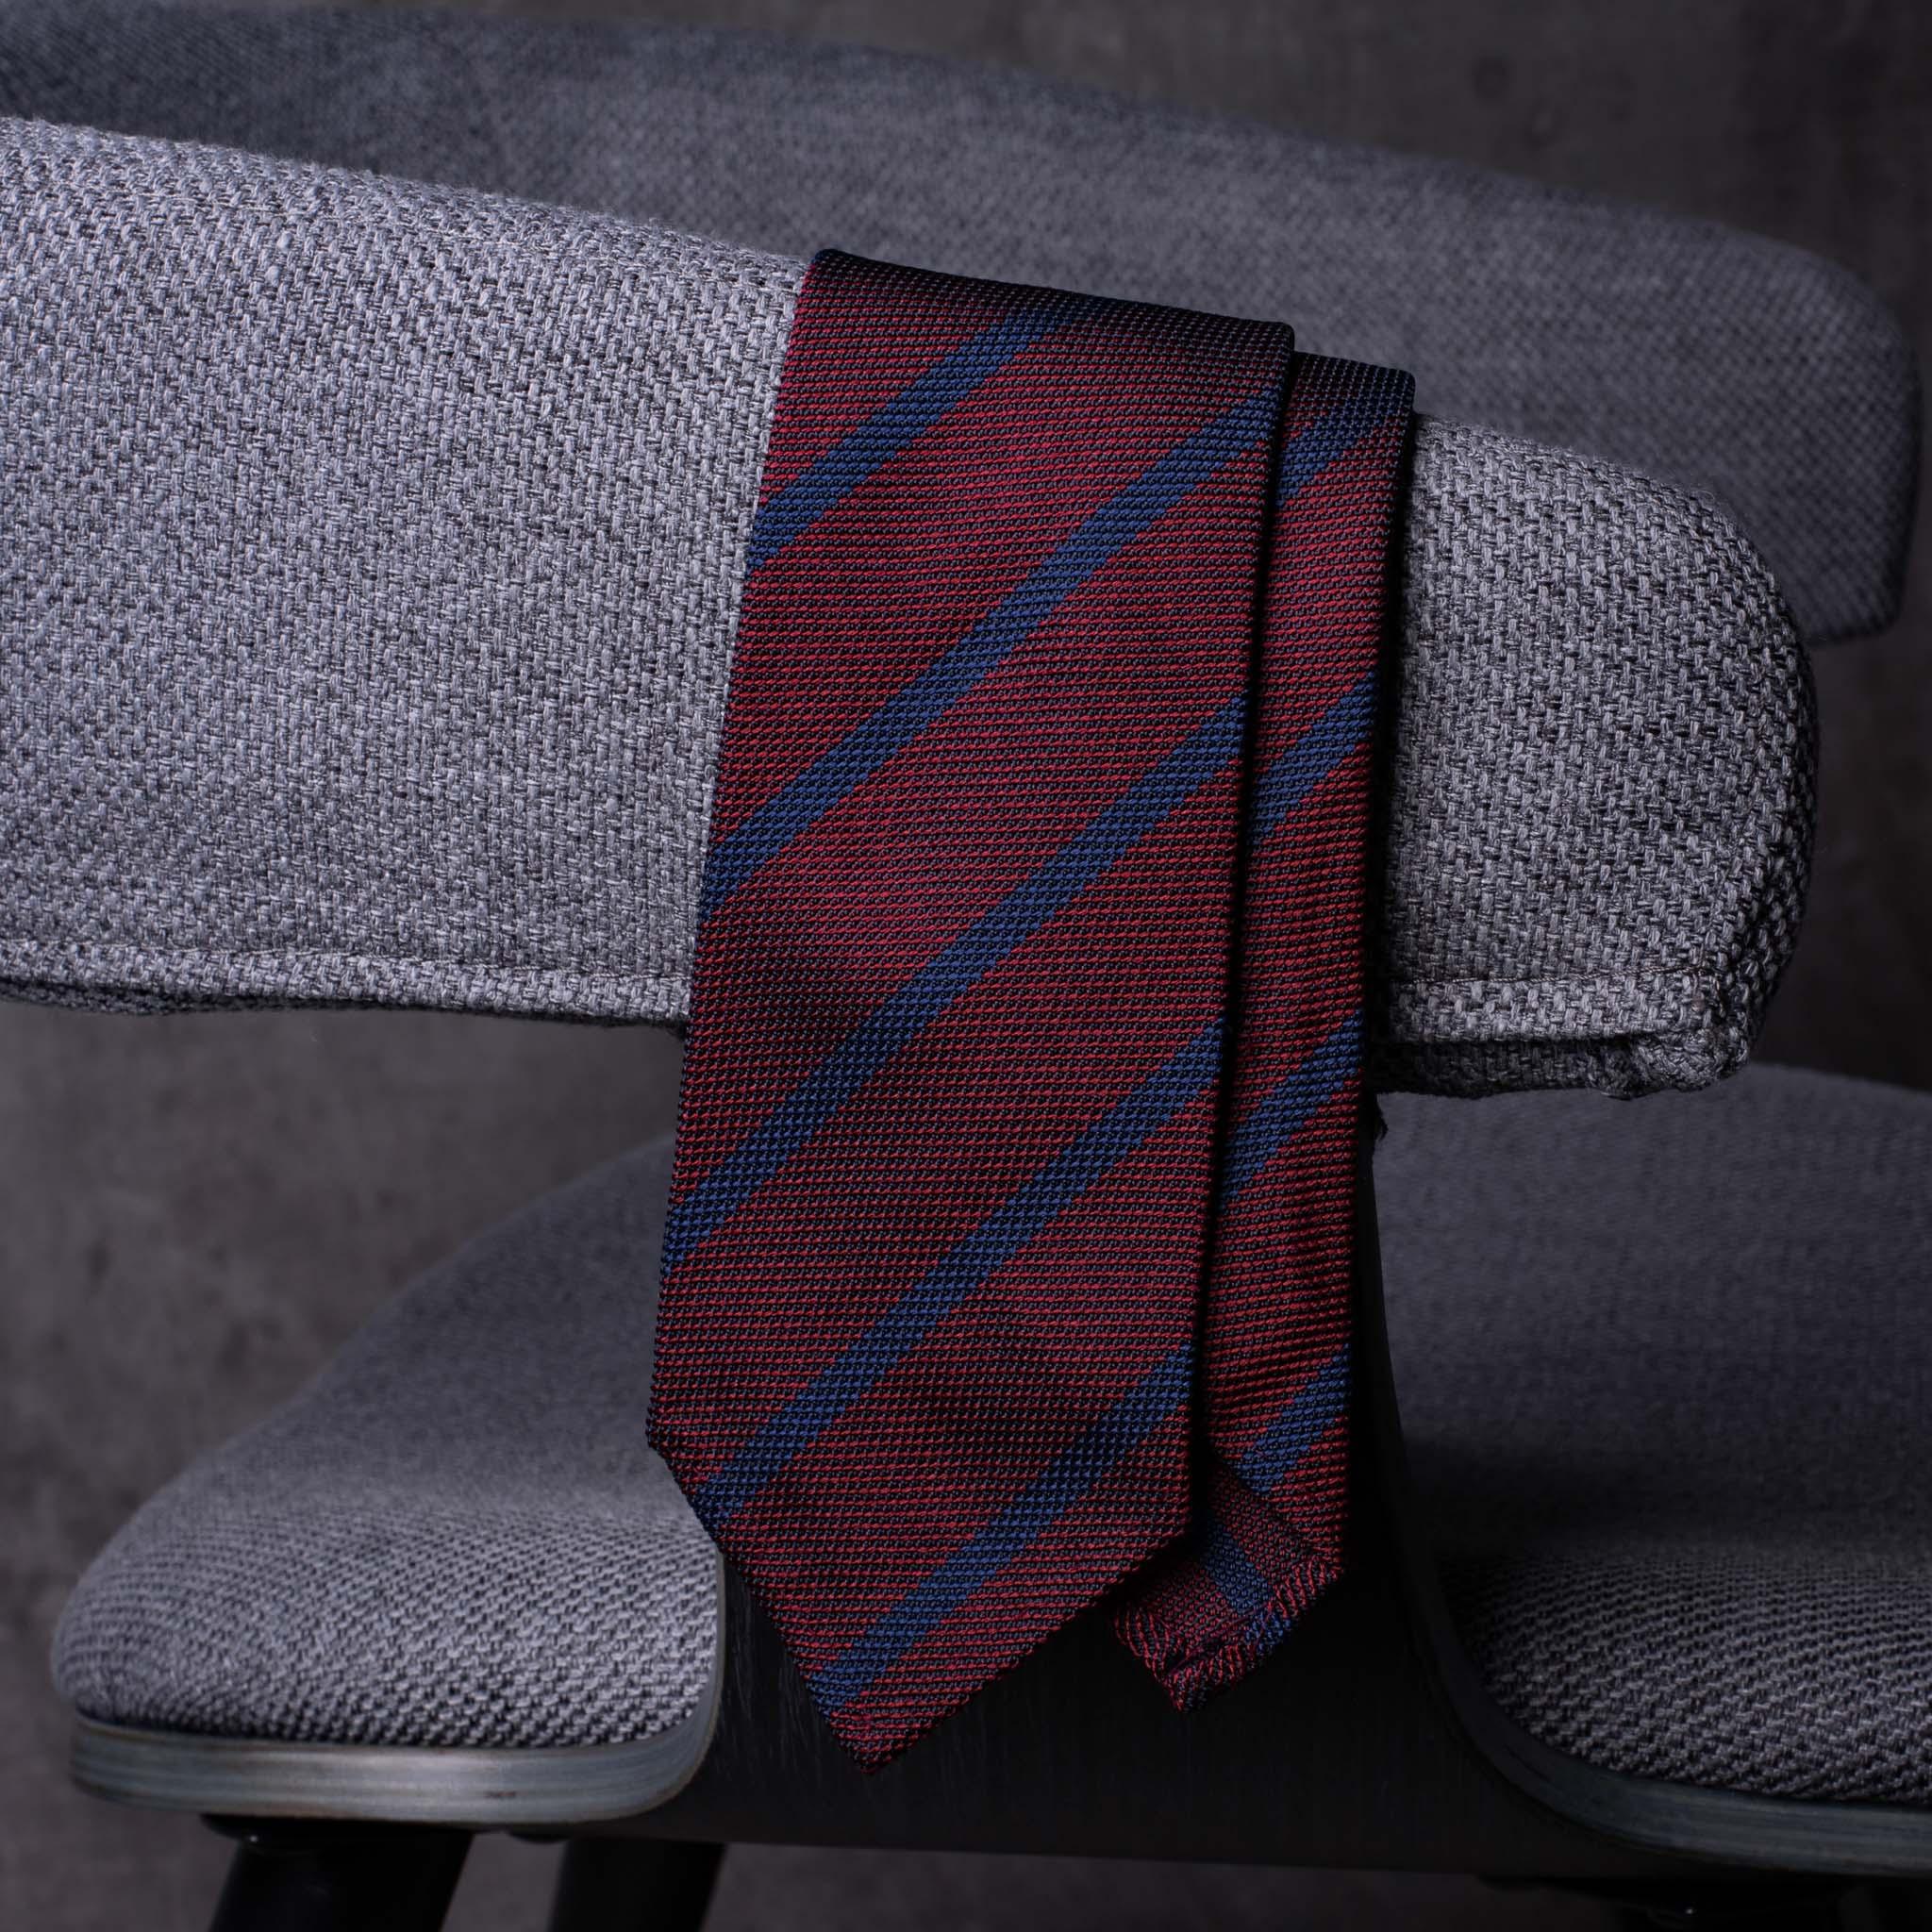 GRENADINE-0534-Tie-Initials-Corbata-Iniciales-The-Seelk-3